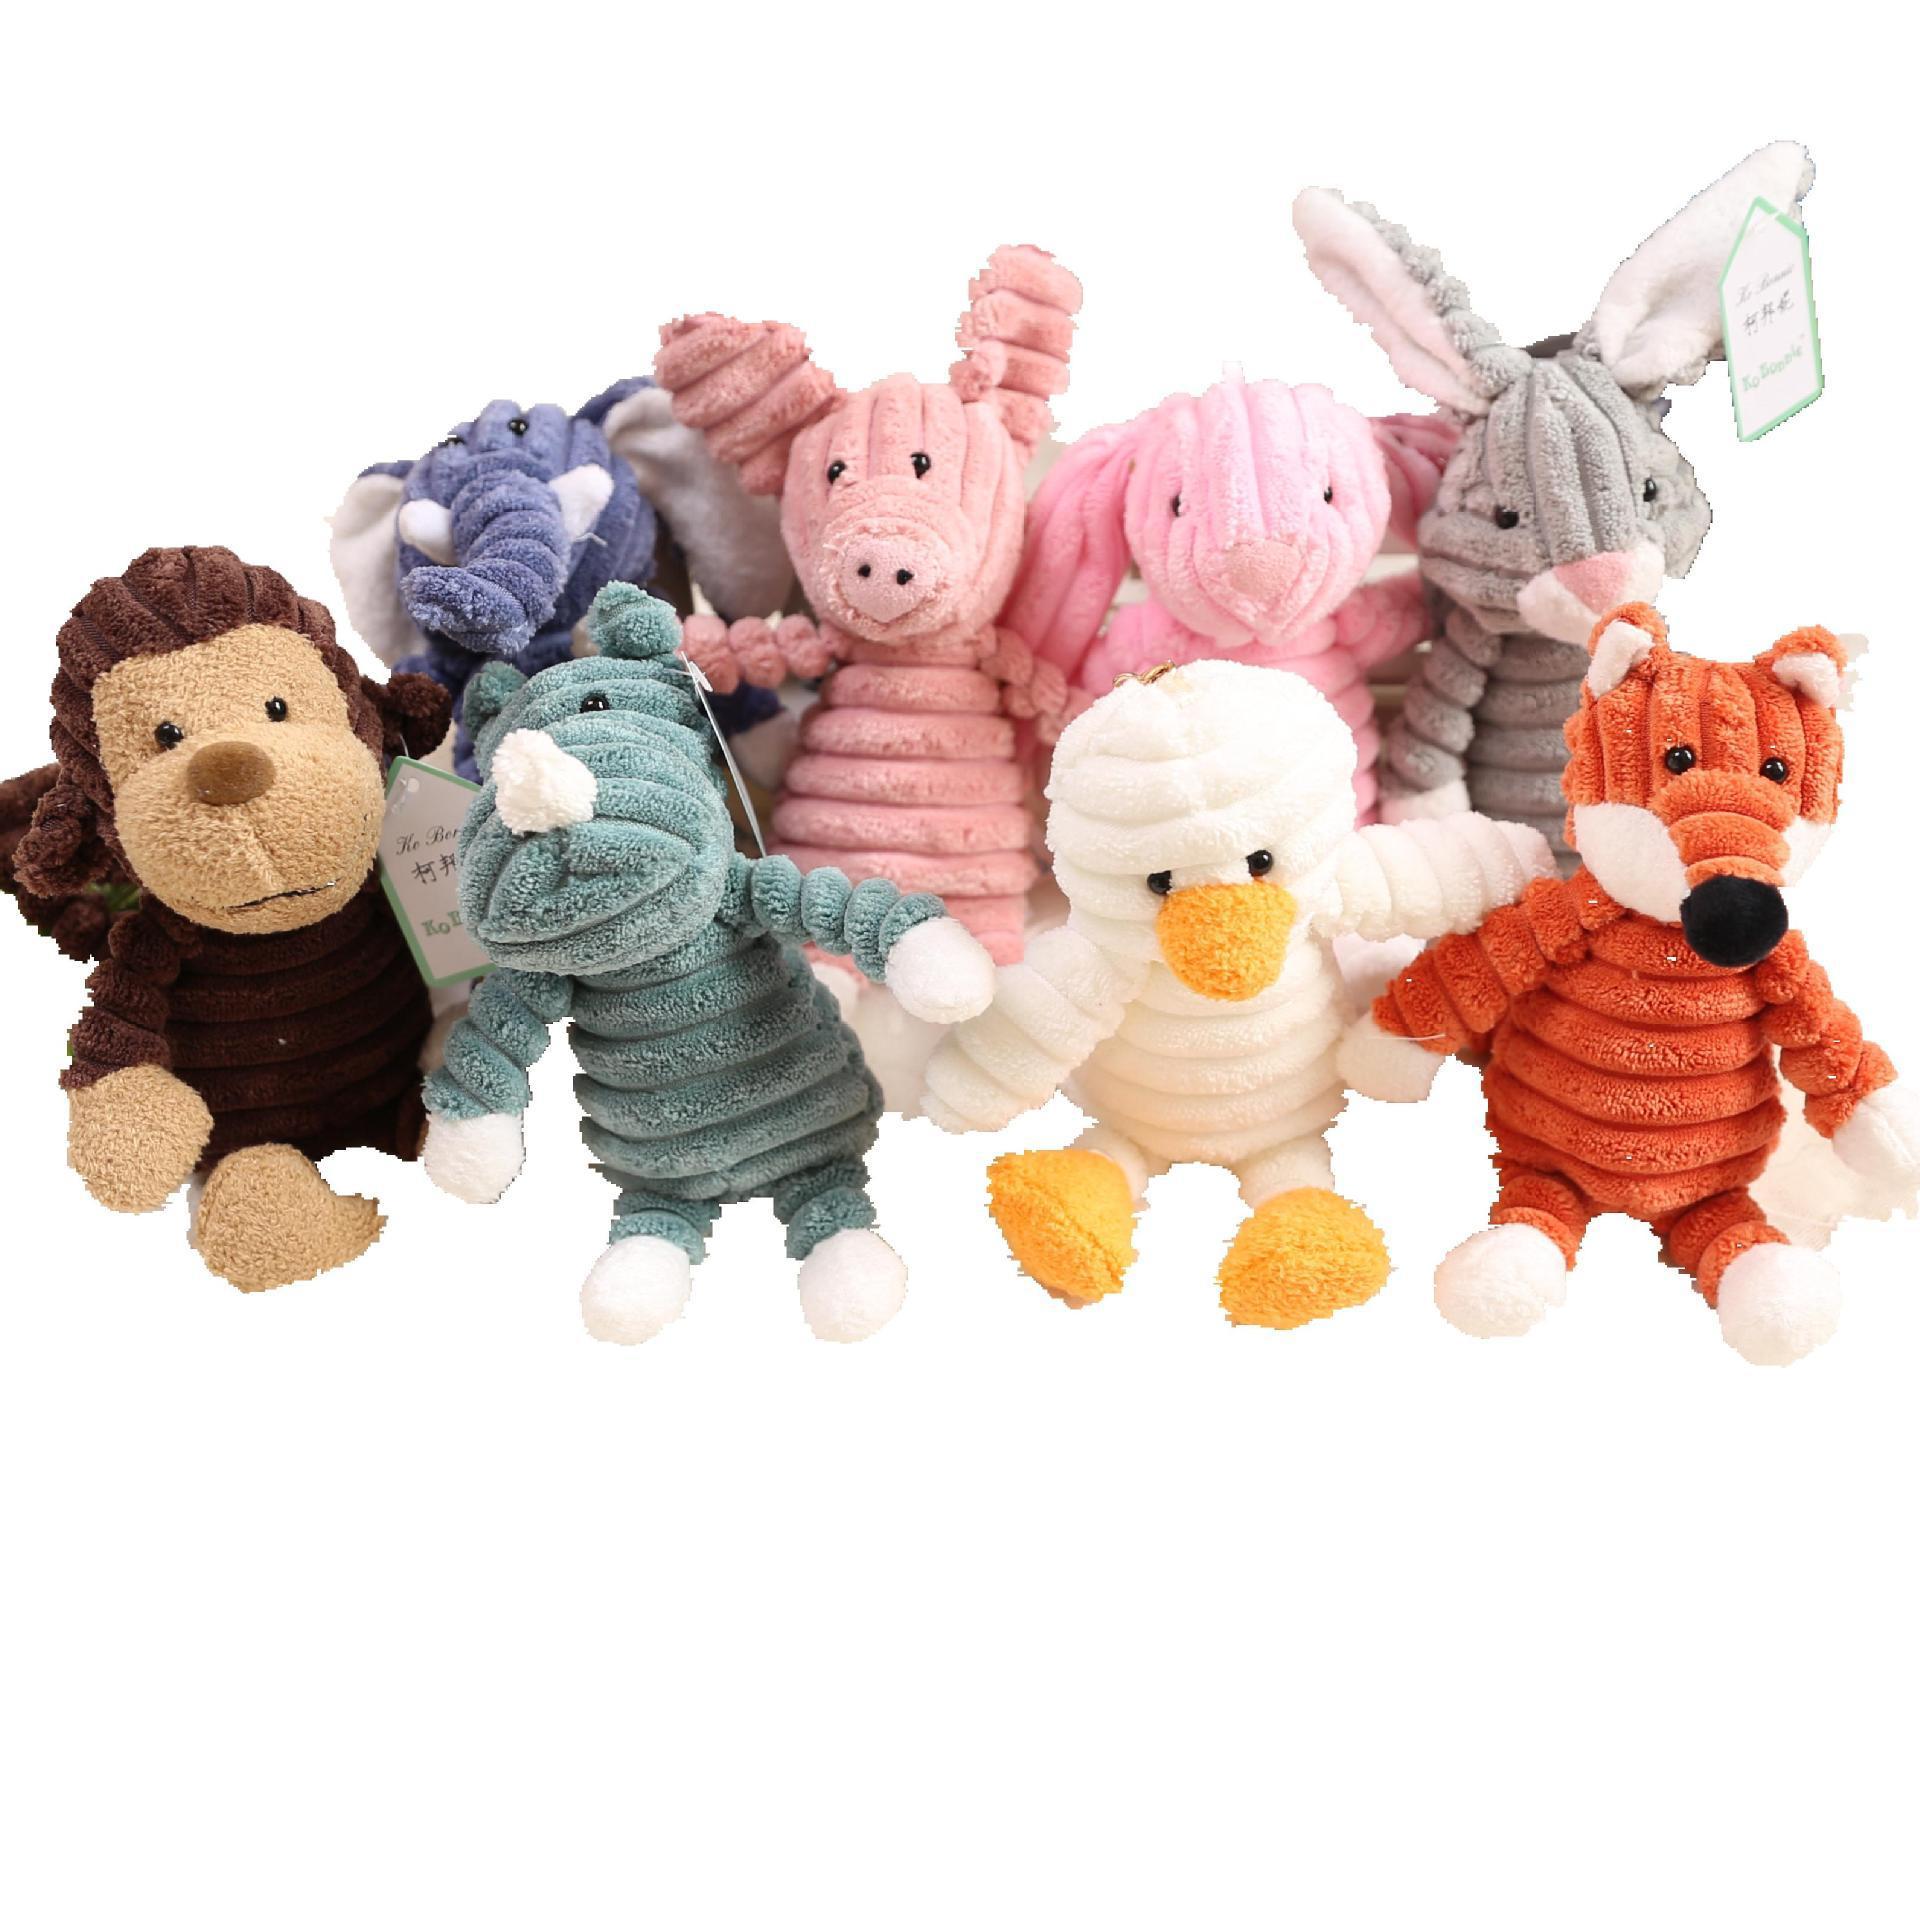 Elephant Rabbit Fox Pig Plush Toy Stuffed Soft Kawaii Animal Cartoon Keychain Lovely Gift For Kids Baby Children Good Quality